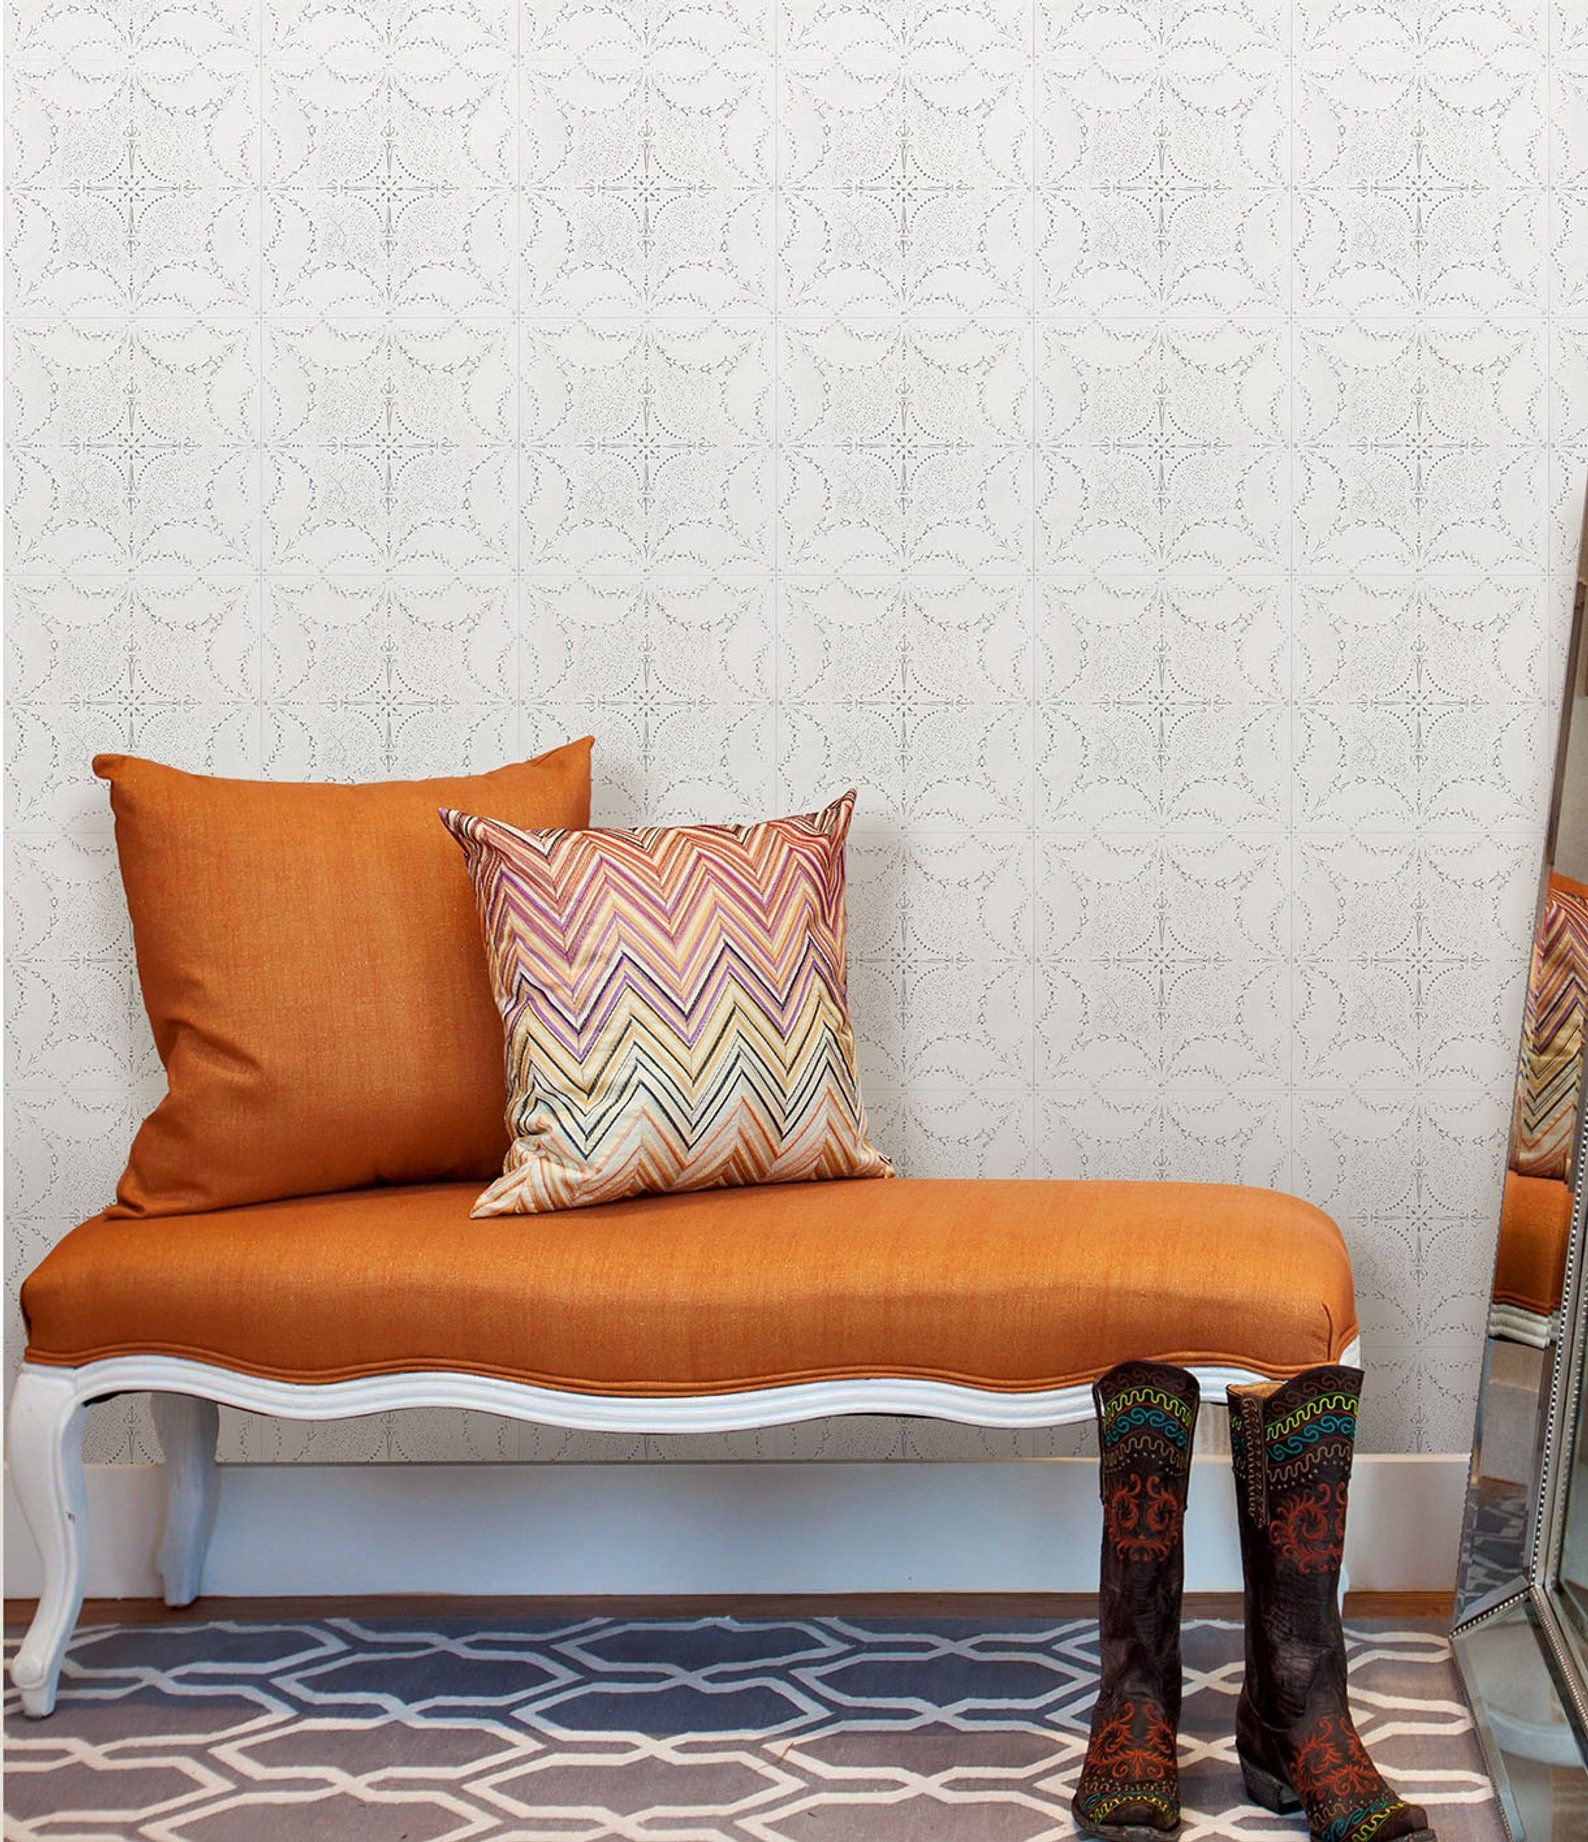 Art Deco Tiles Wallpaper, Temporary Geometric Wall Paper